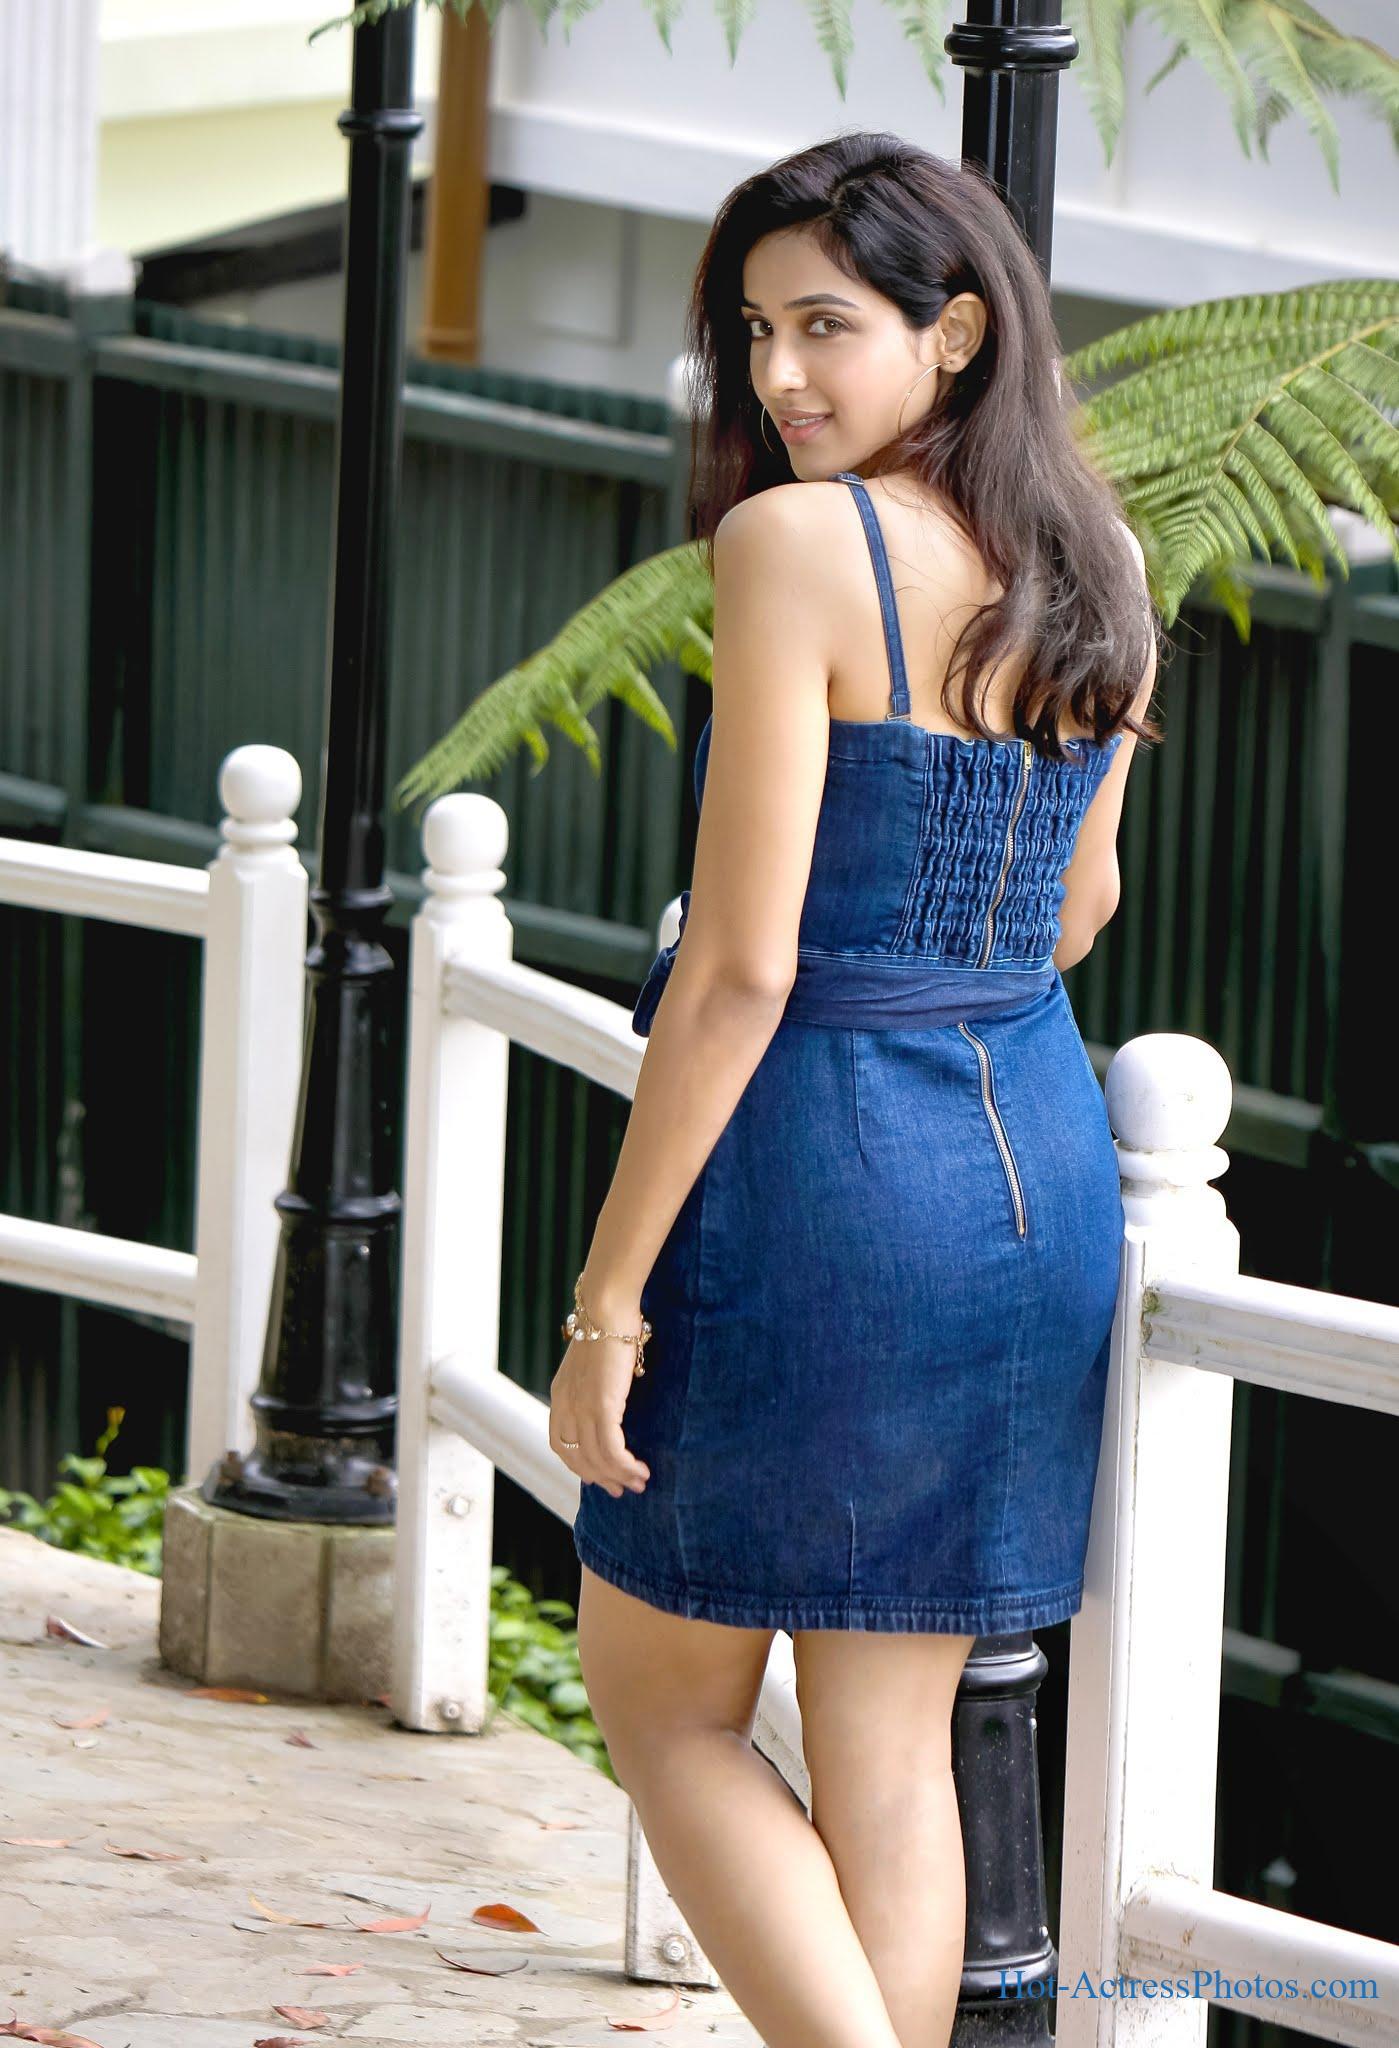 Riya Suman Photoshoot Latest Hot Legs And Thighs Photos